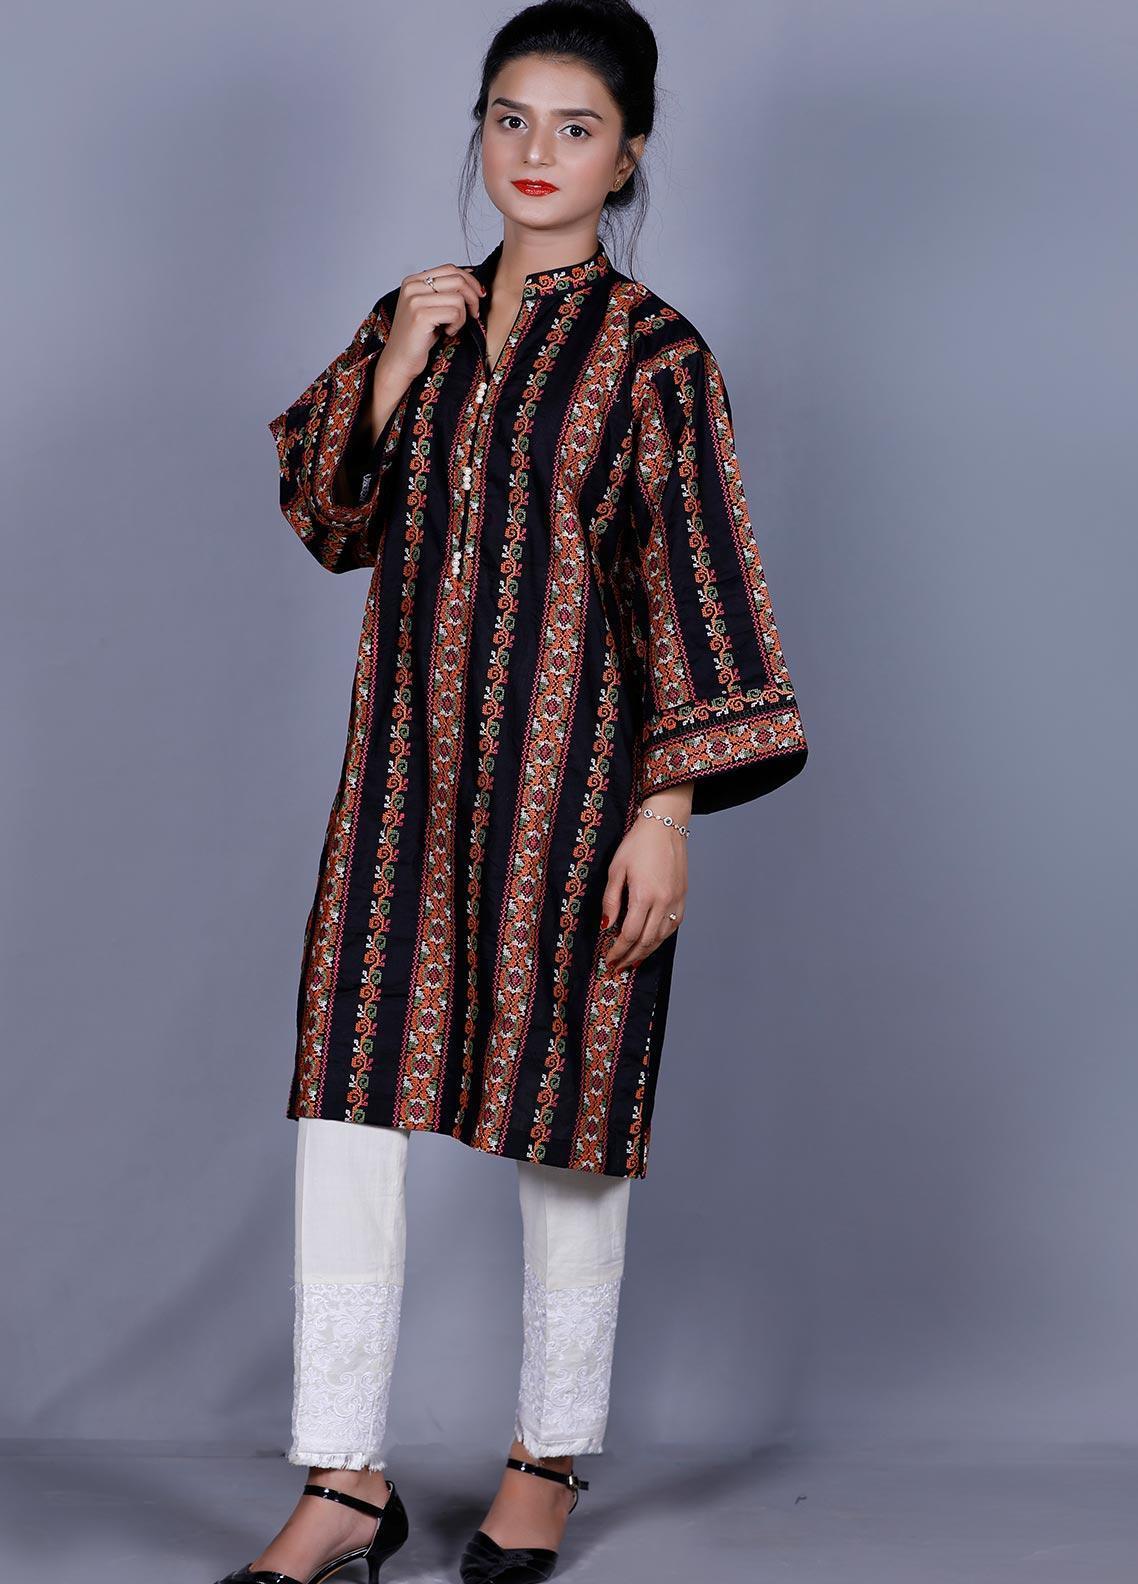 Addee Embroidered Cotton Stitched Kurtis K003 Black